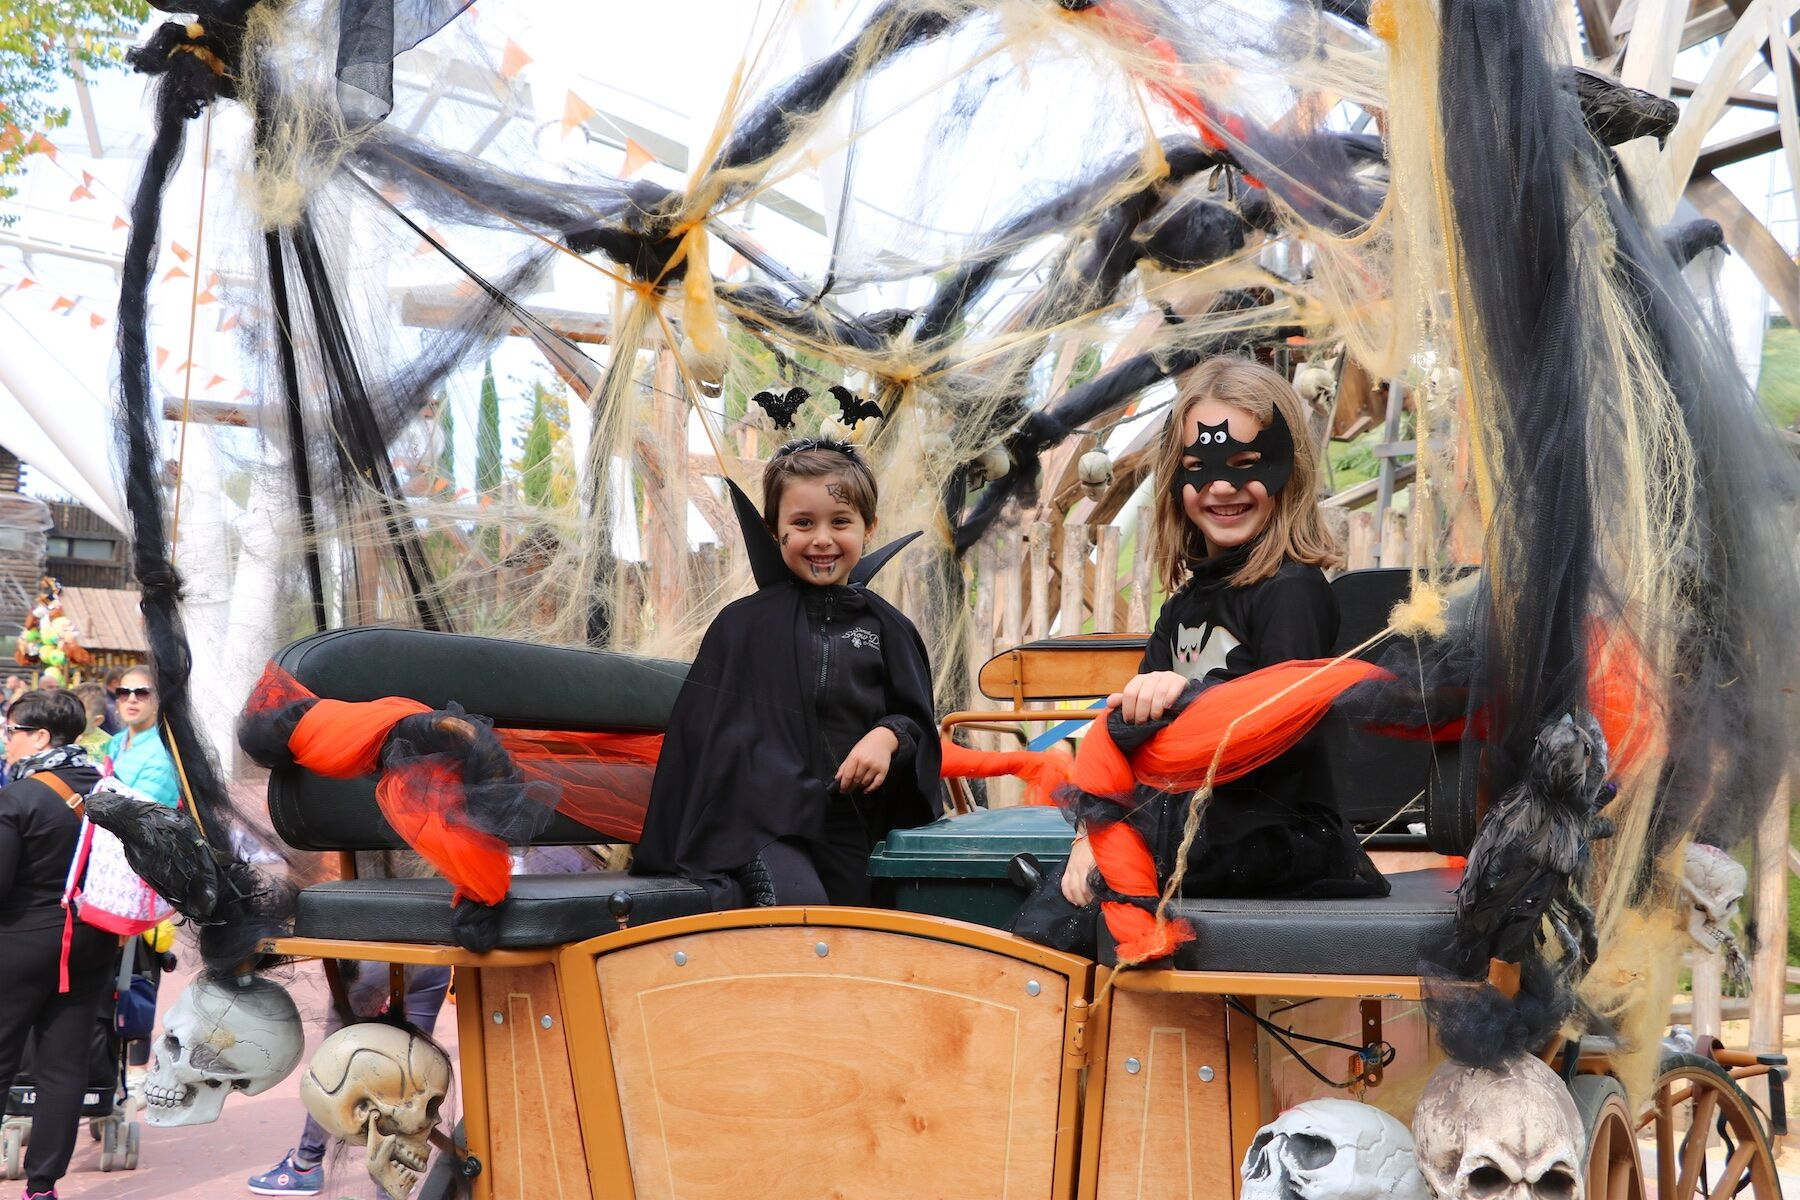 ccb2135a3 Eventi per bambini Halloween 2018 - Familygo